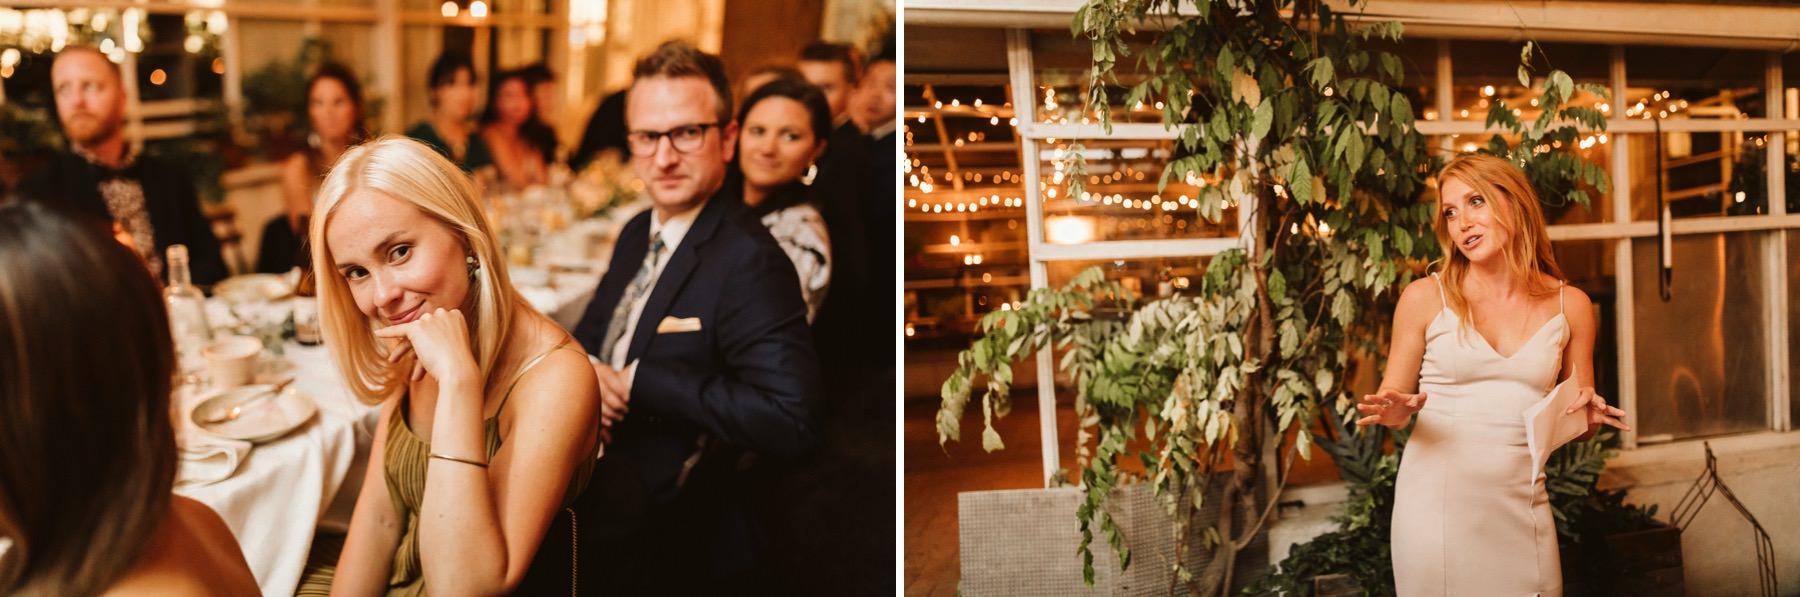 Swedish wedding speech